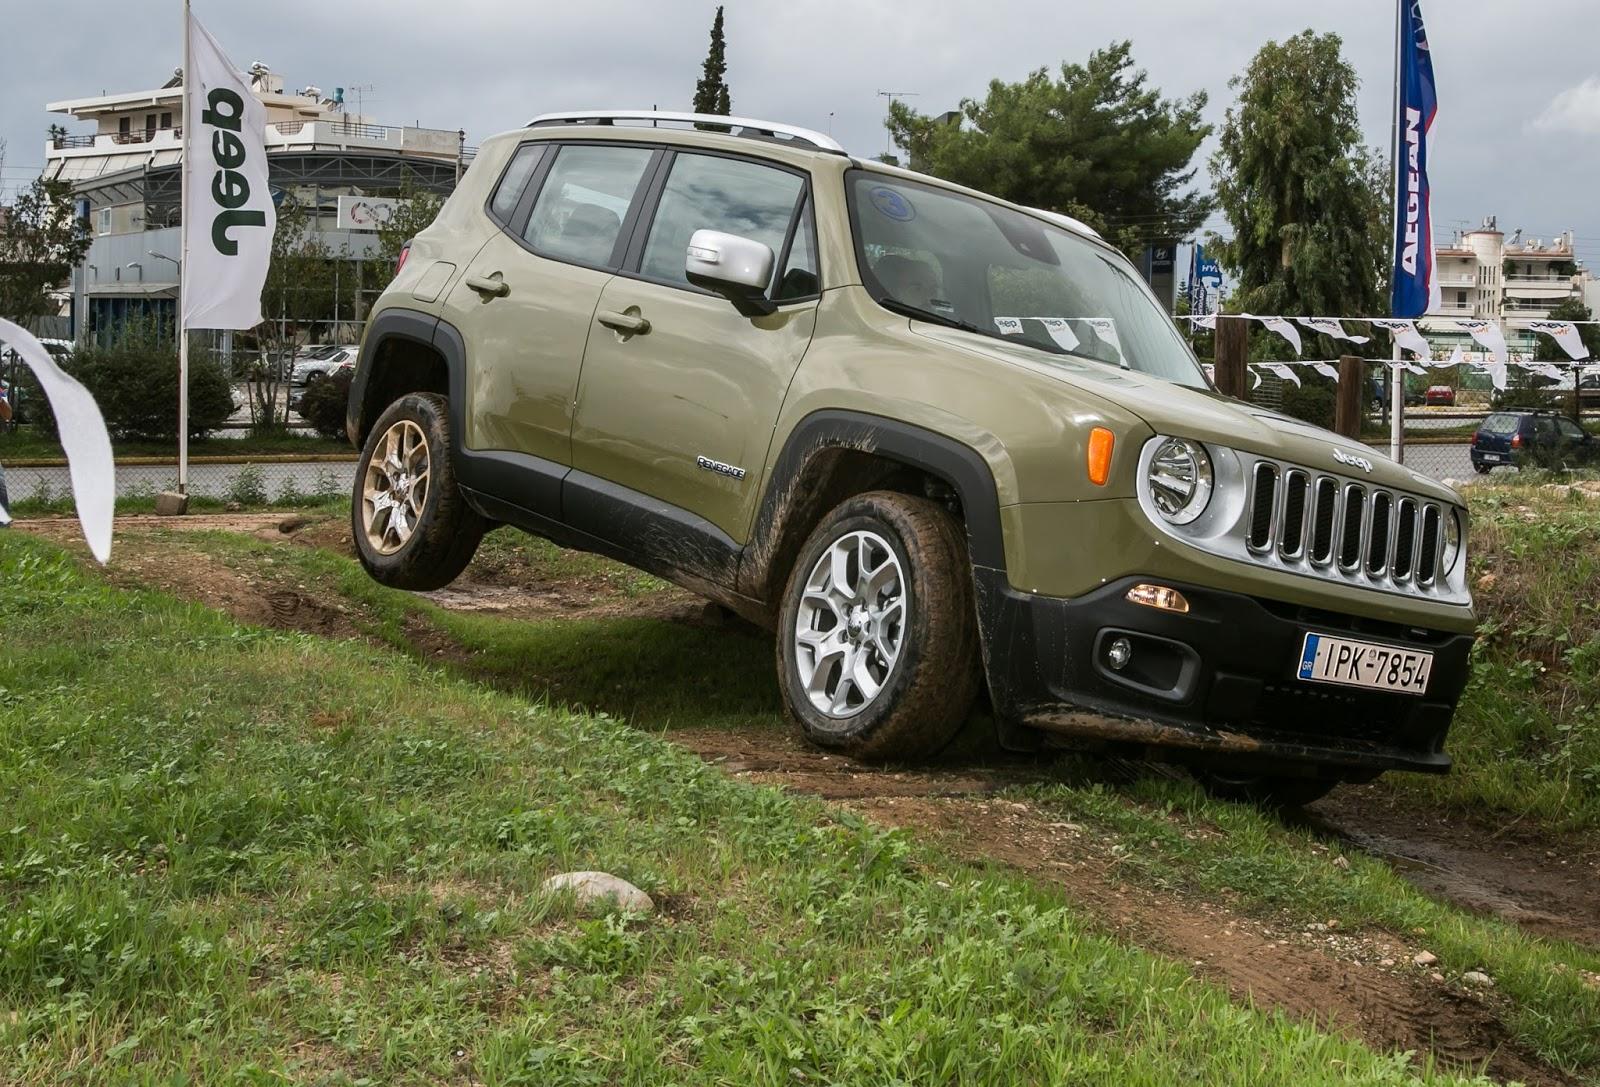 GK 0421 Πετάμε ένα Jeep Renegade σε λάσπες, πέτρες, άμμο, λίμνες. Θα τα καταφέρει; Jeep, Jeep Renegade, Renegade, SUV, TEST, zblog, ΔΟΚΙΜΕΣ